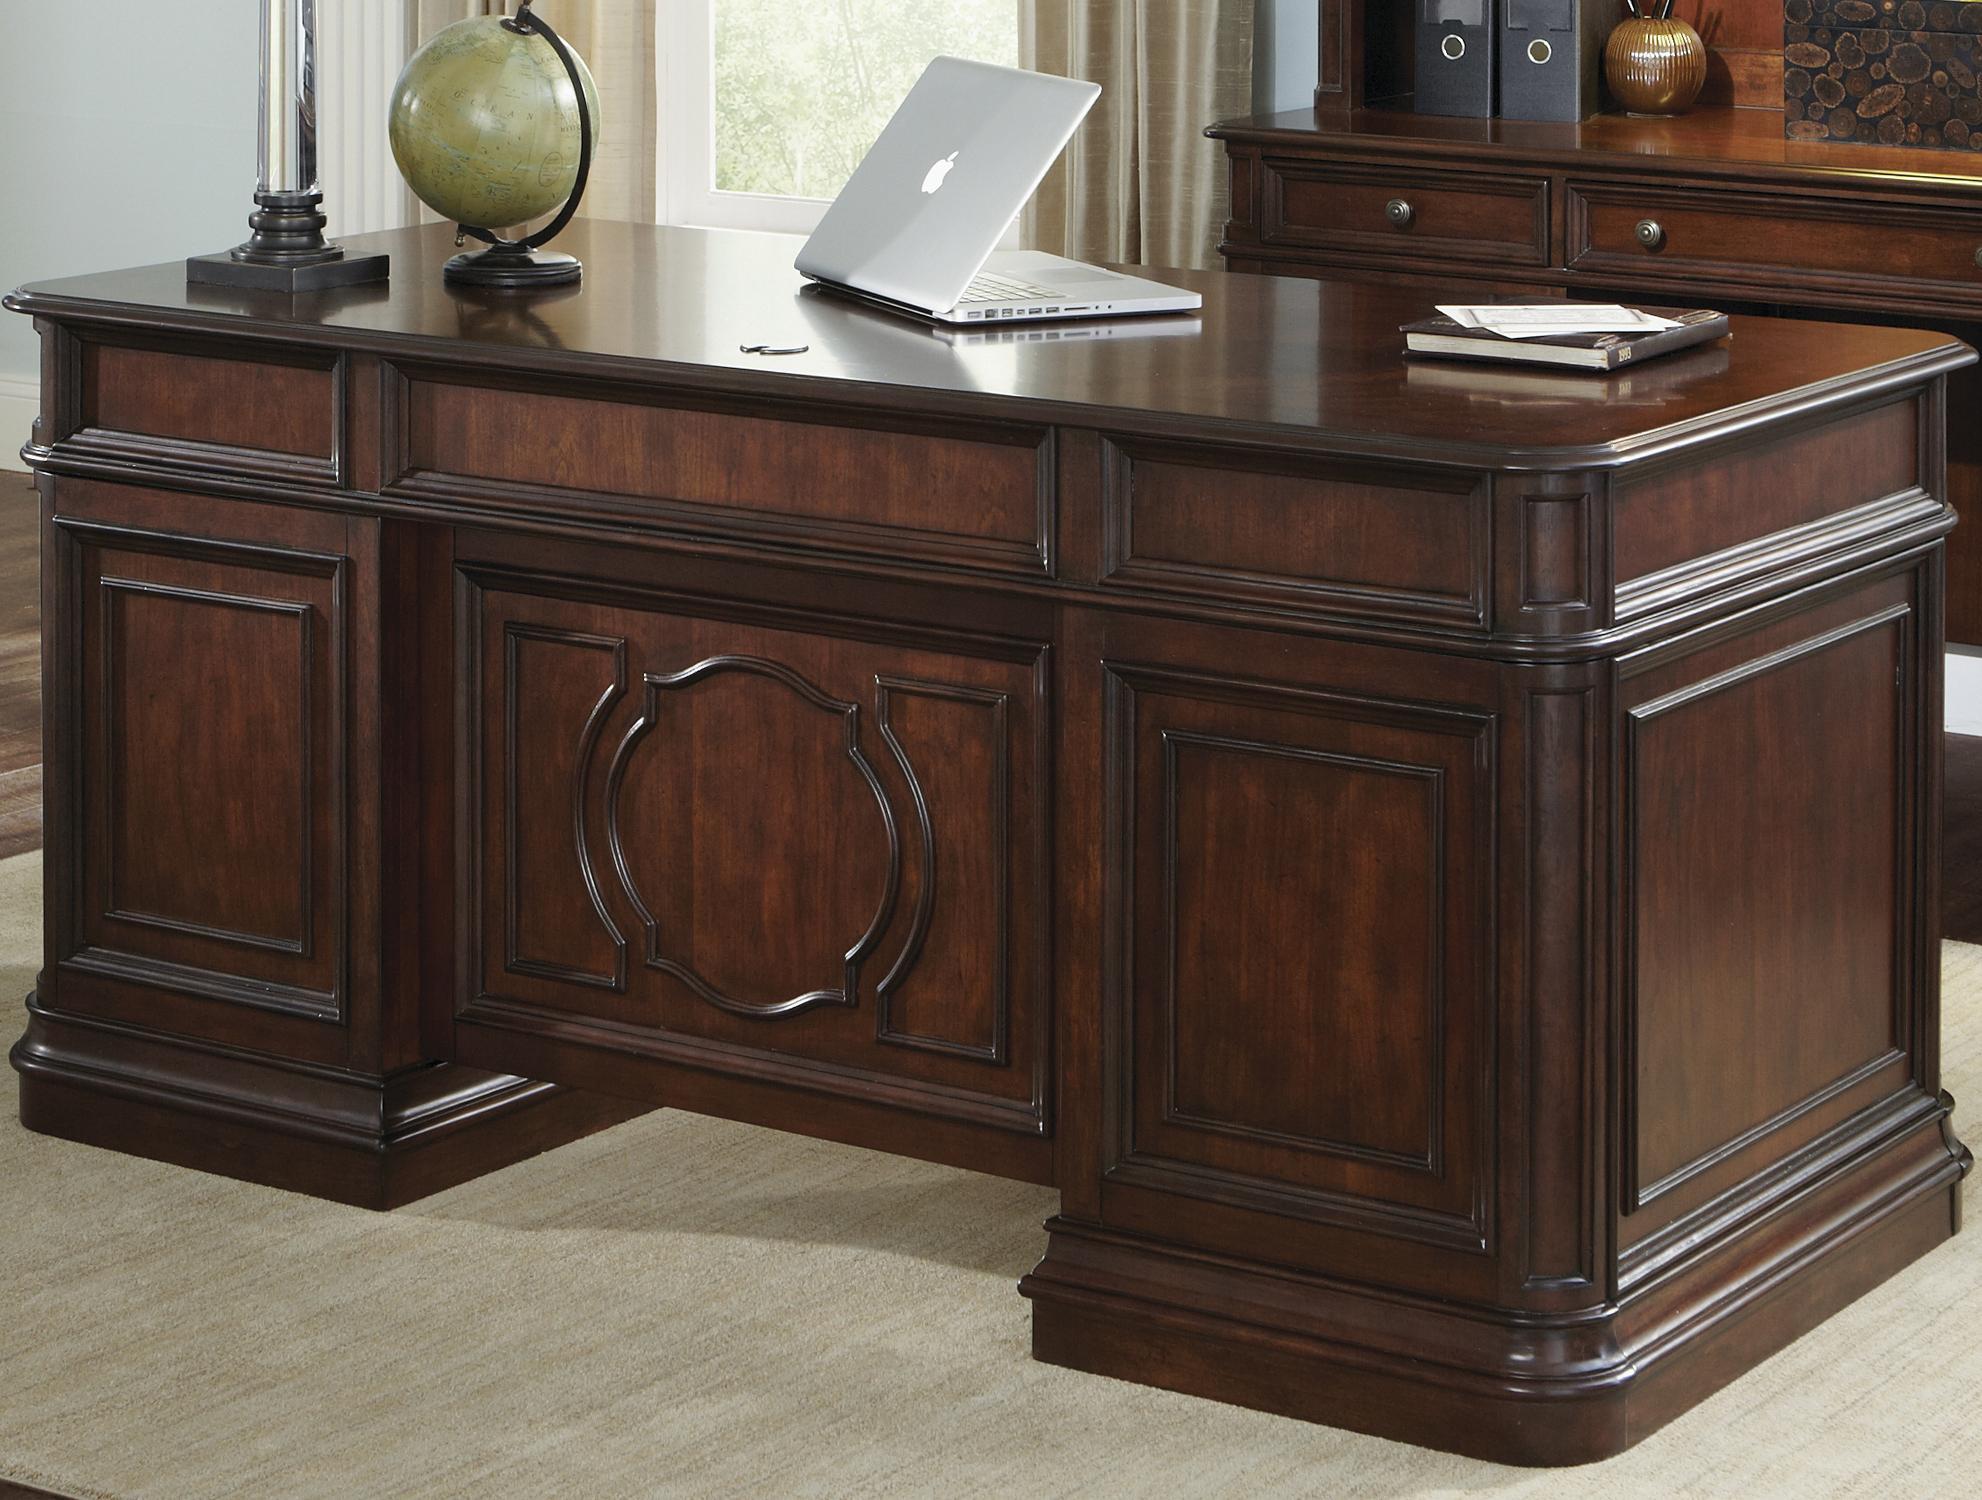 Liberty Furniture Brayton Manor Jr Executive Desk - Item Number: 273-HO105B+T